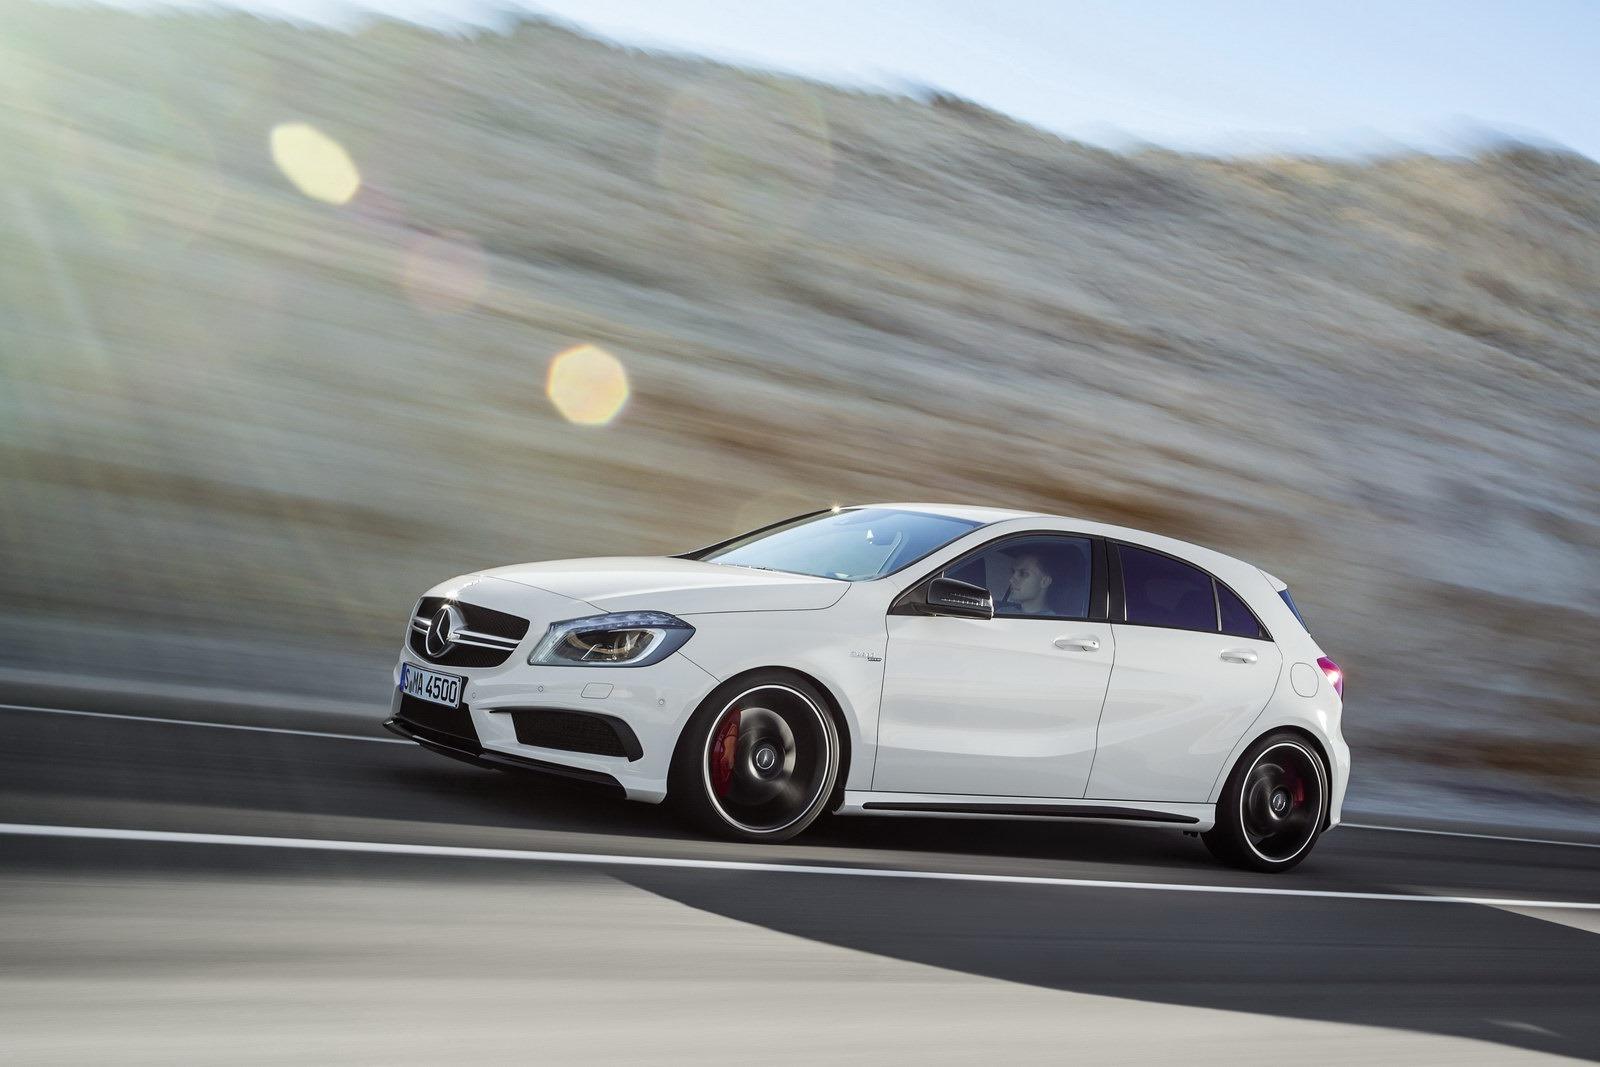 http://2.bp.blogspot.com/-VmCEcIy3fY4/UTfEv_f1hKI/AAAAAAAASWY/CRYh6QQrJ6k/s1600/Mercedes-Benz-A-45-AMG-16%5B2%5D.jpg